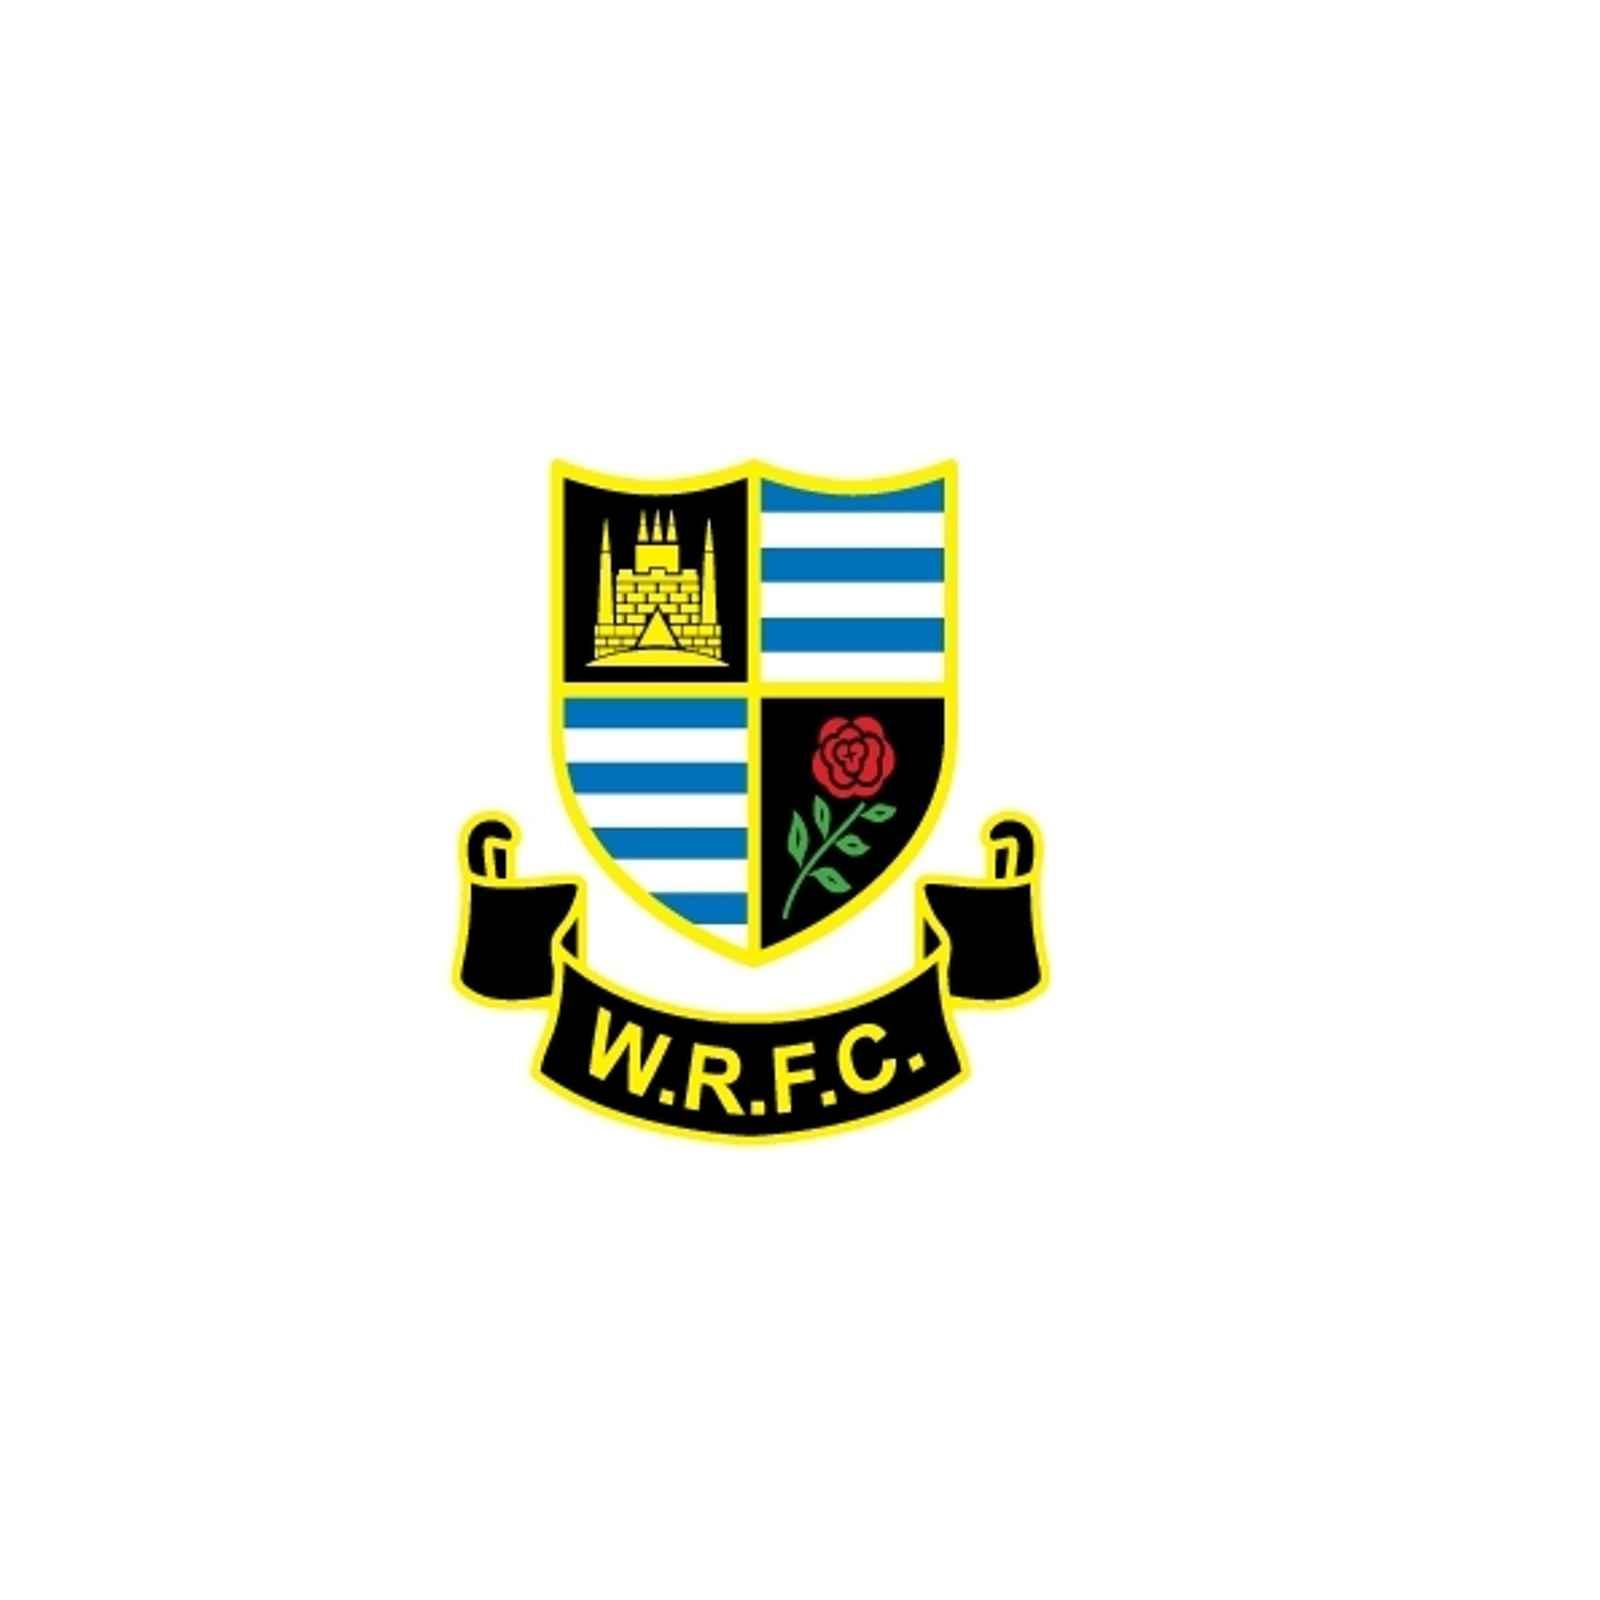 Our team is Warlingham Rugby Club - MightyWarl